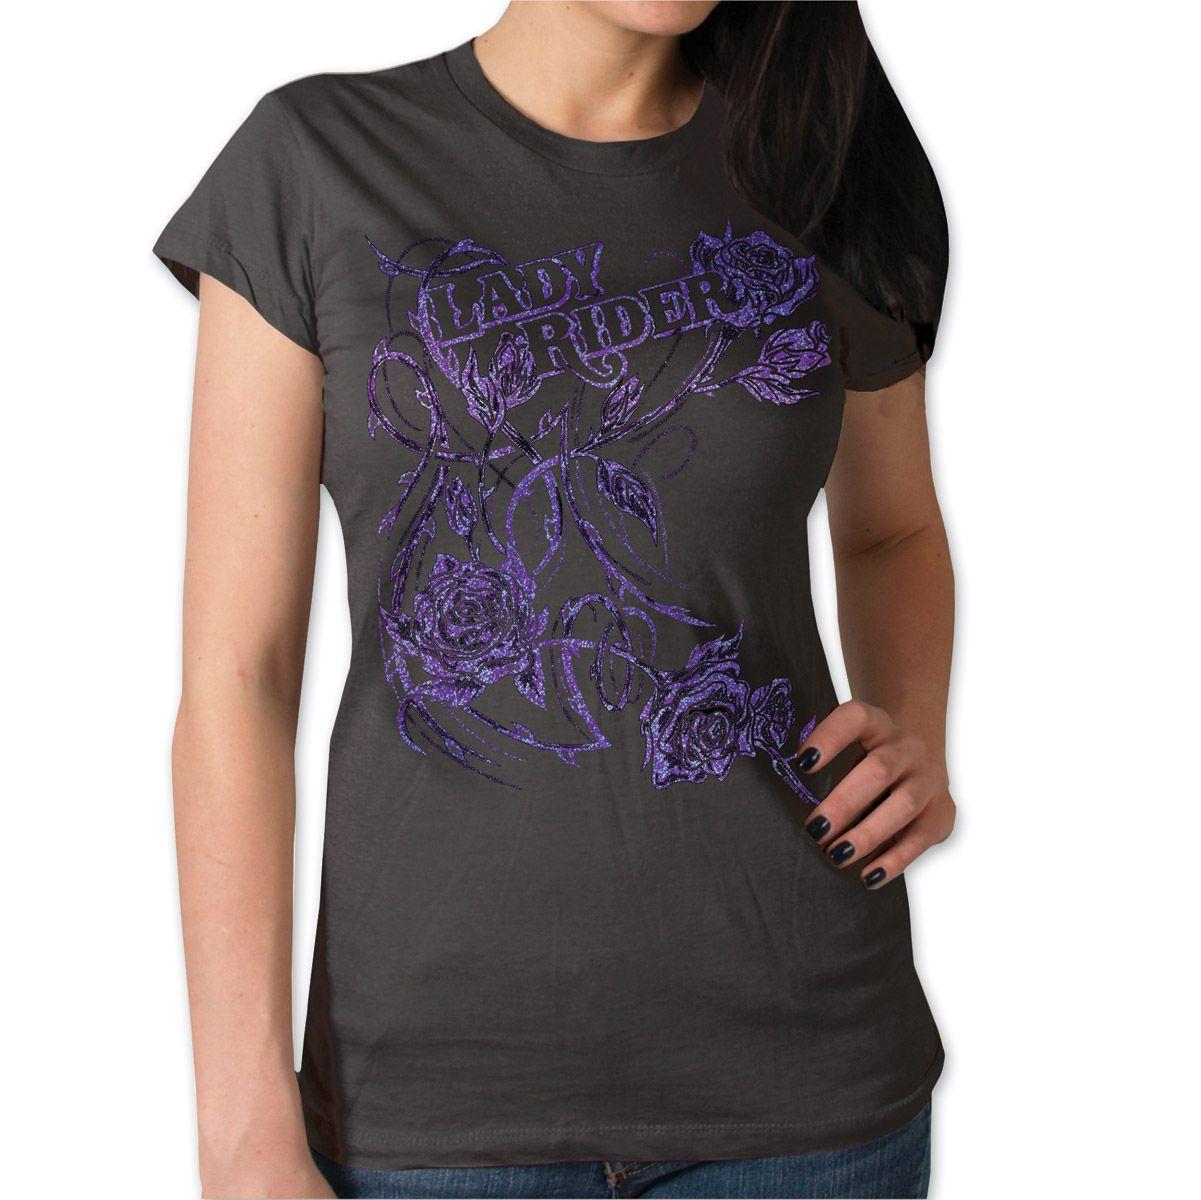 Hot Leathers Glitter Roses Women's Smoke T-Shirt | 177-942 | J&P Cycles